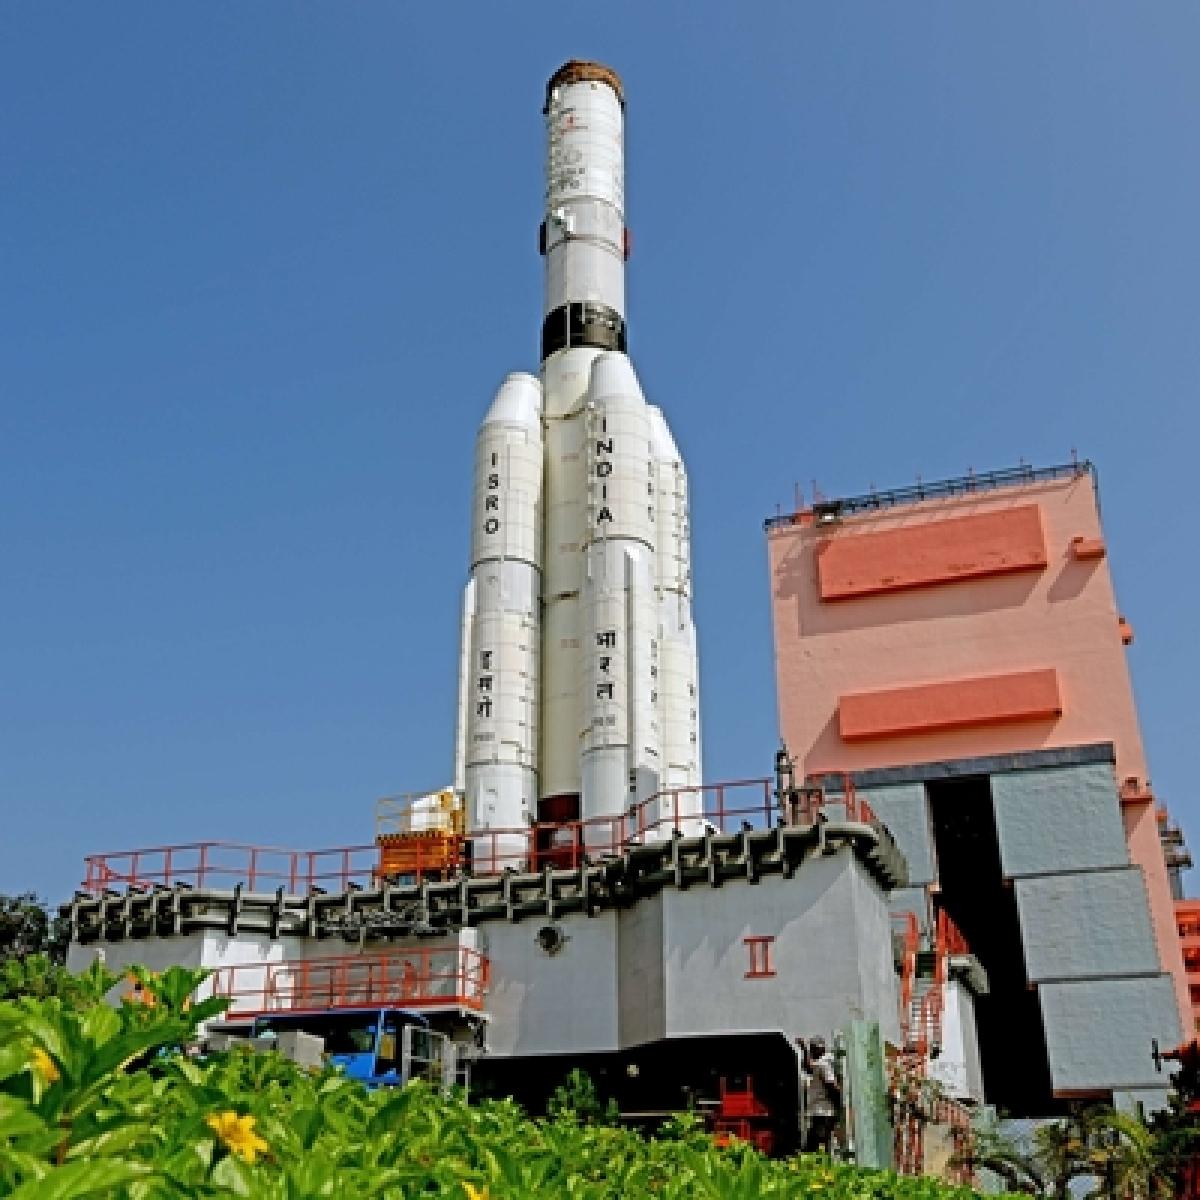 ISRO to launch geo imaging satellite, GISAT-1 from Satish Dhawan Space Centre in Sriharikota on March 5